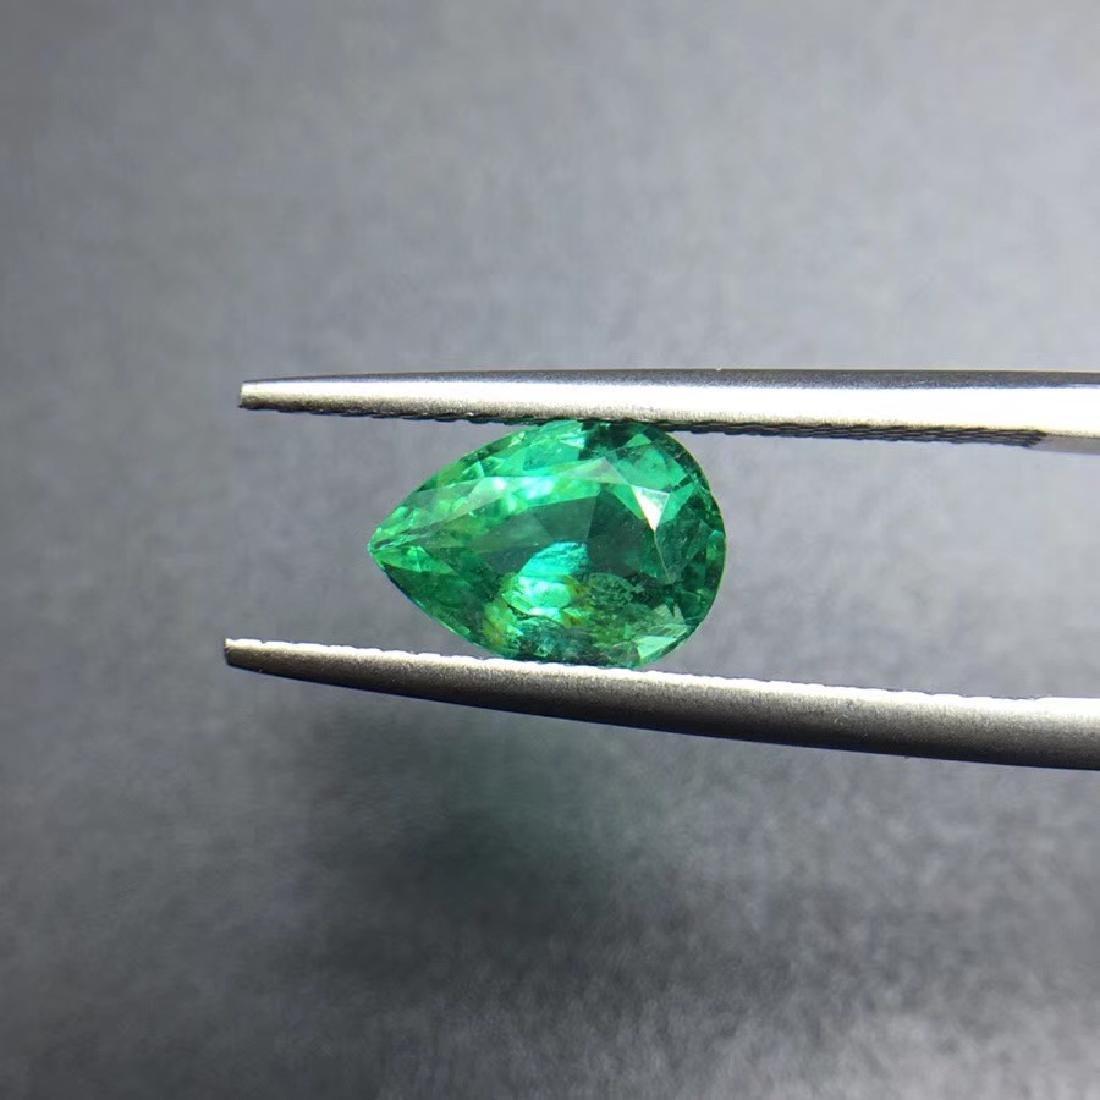 1.43 ct Emerald 6.2*8.9*4.7 mm Pear Cut